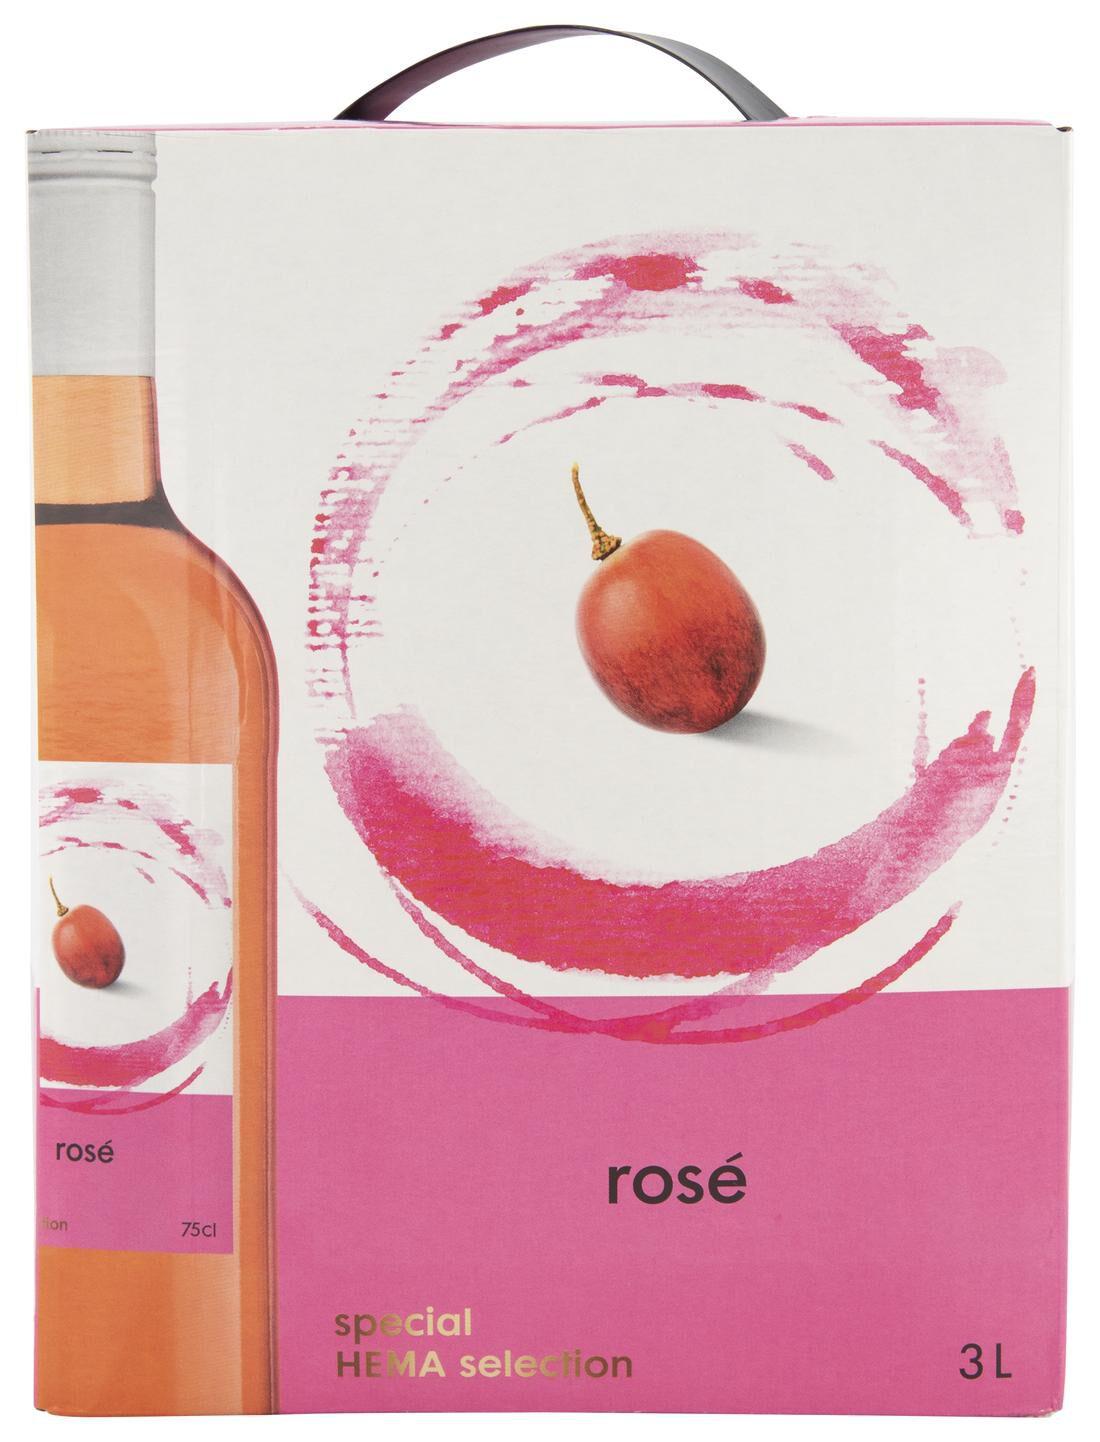 HEMA Huiswijn Rosé Bag-in-box - 3 L